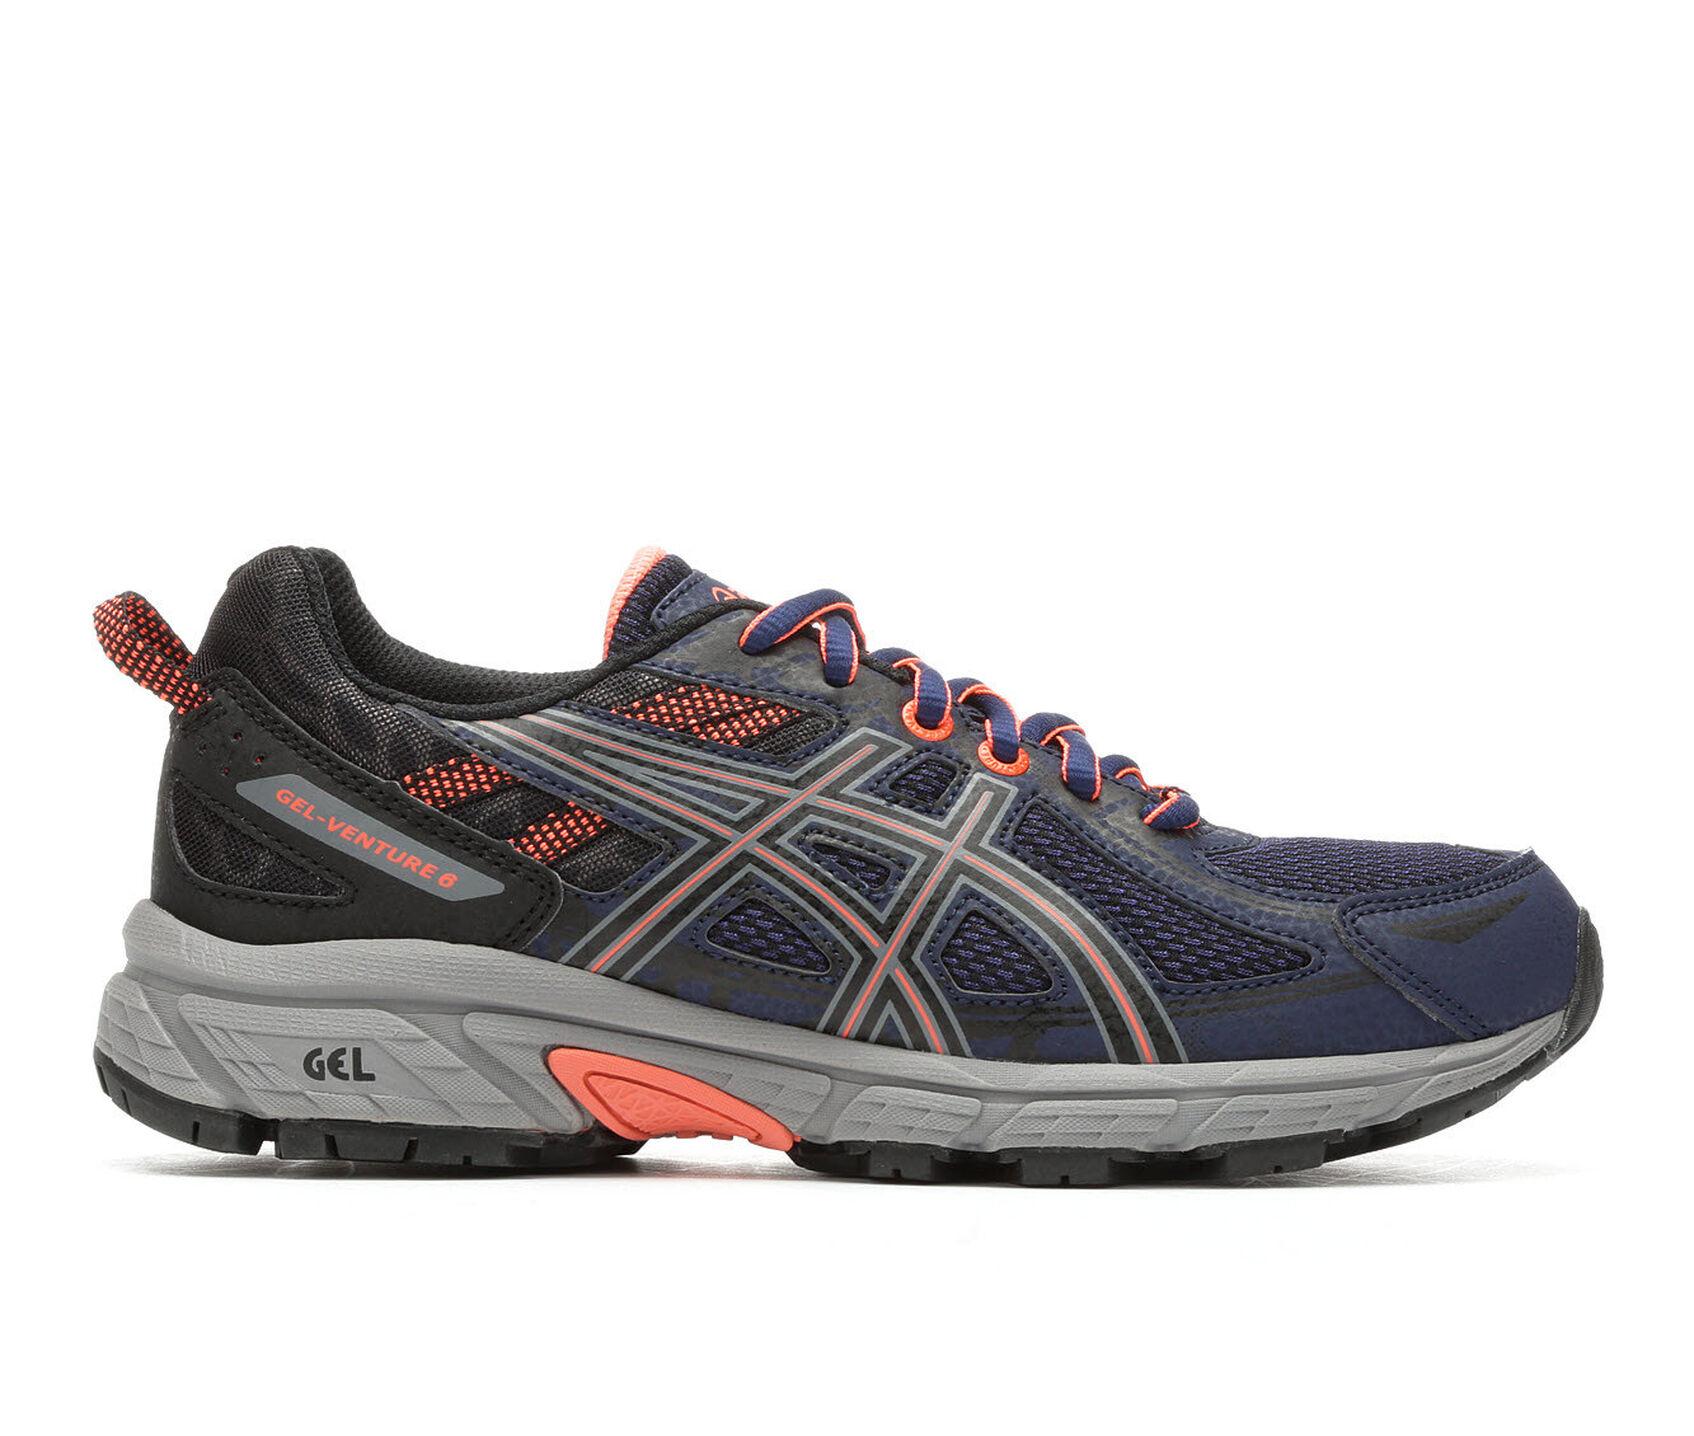 ... ASICS Gel Venture 6 Trail Running Shoes. Carousel Controls 210ea1d50